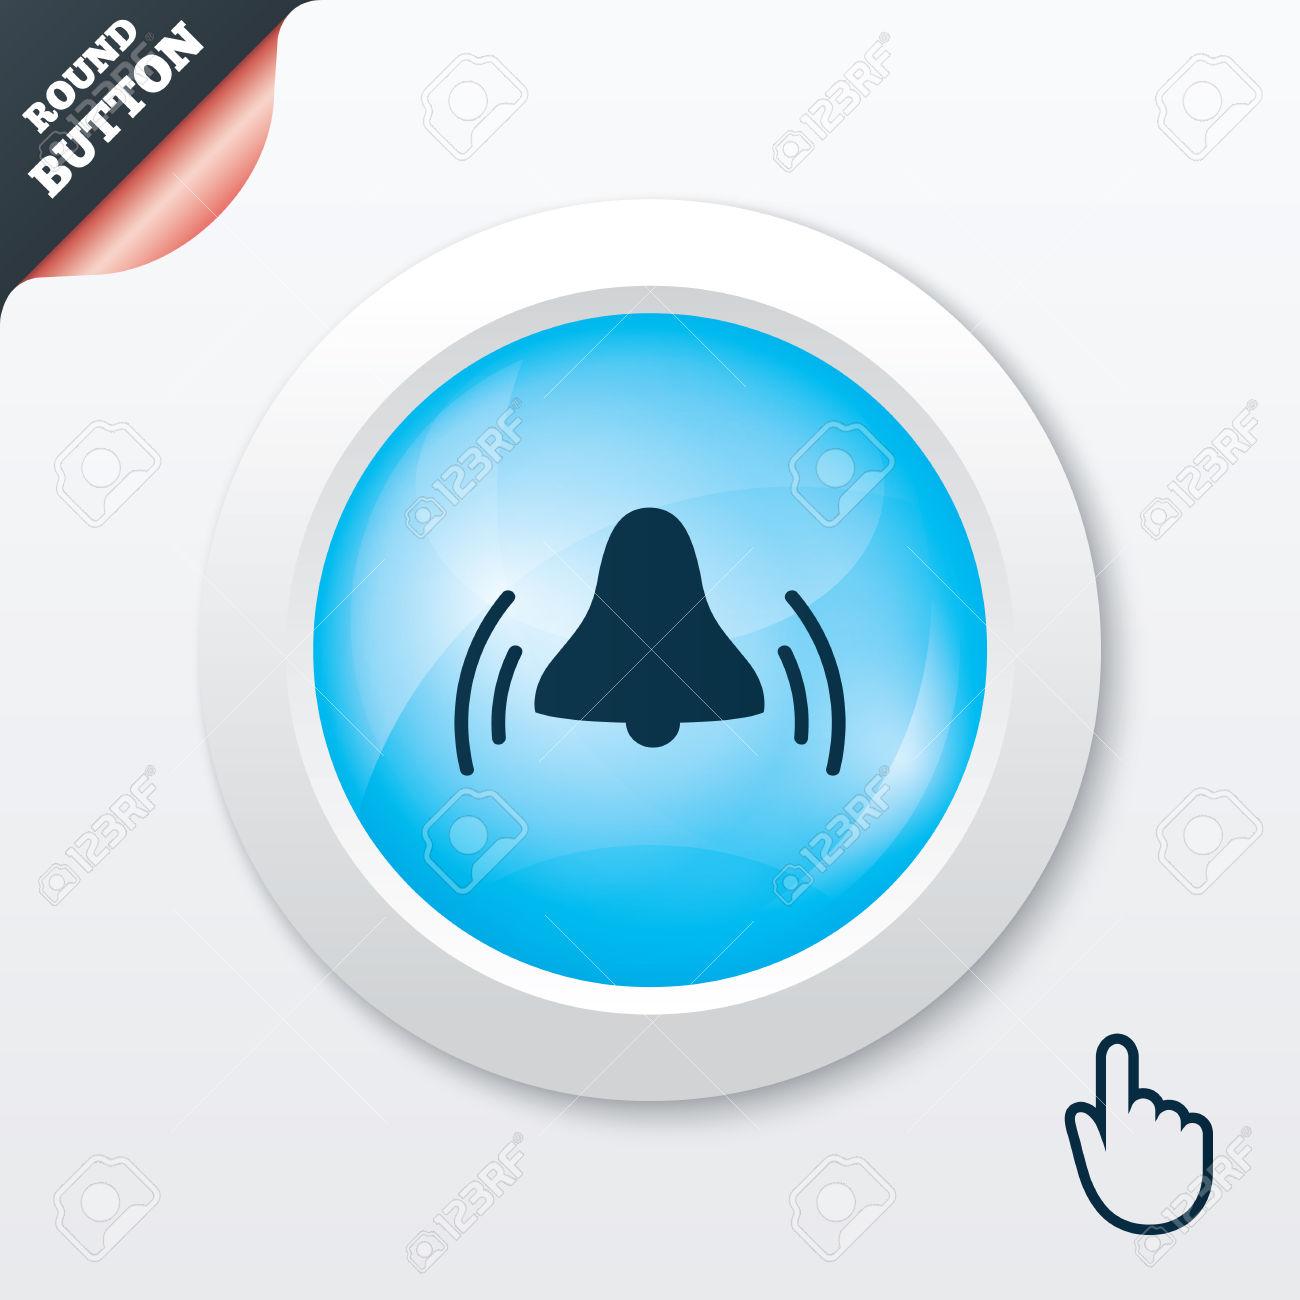 Alarm Bell Sign Icon. Wake Up Alarm Symbol. Blue Shiny Button.